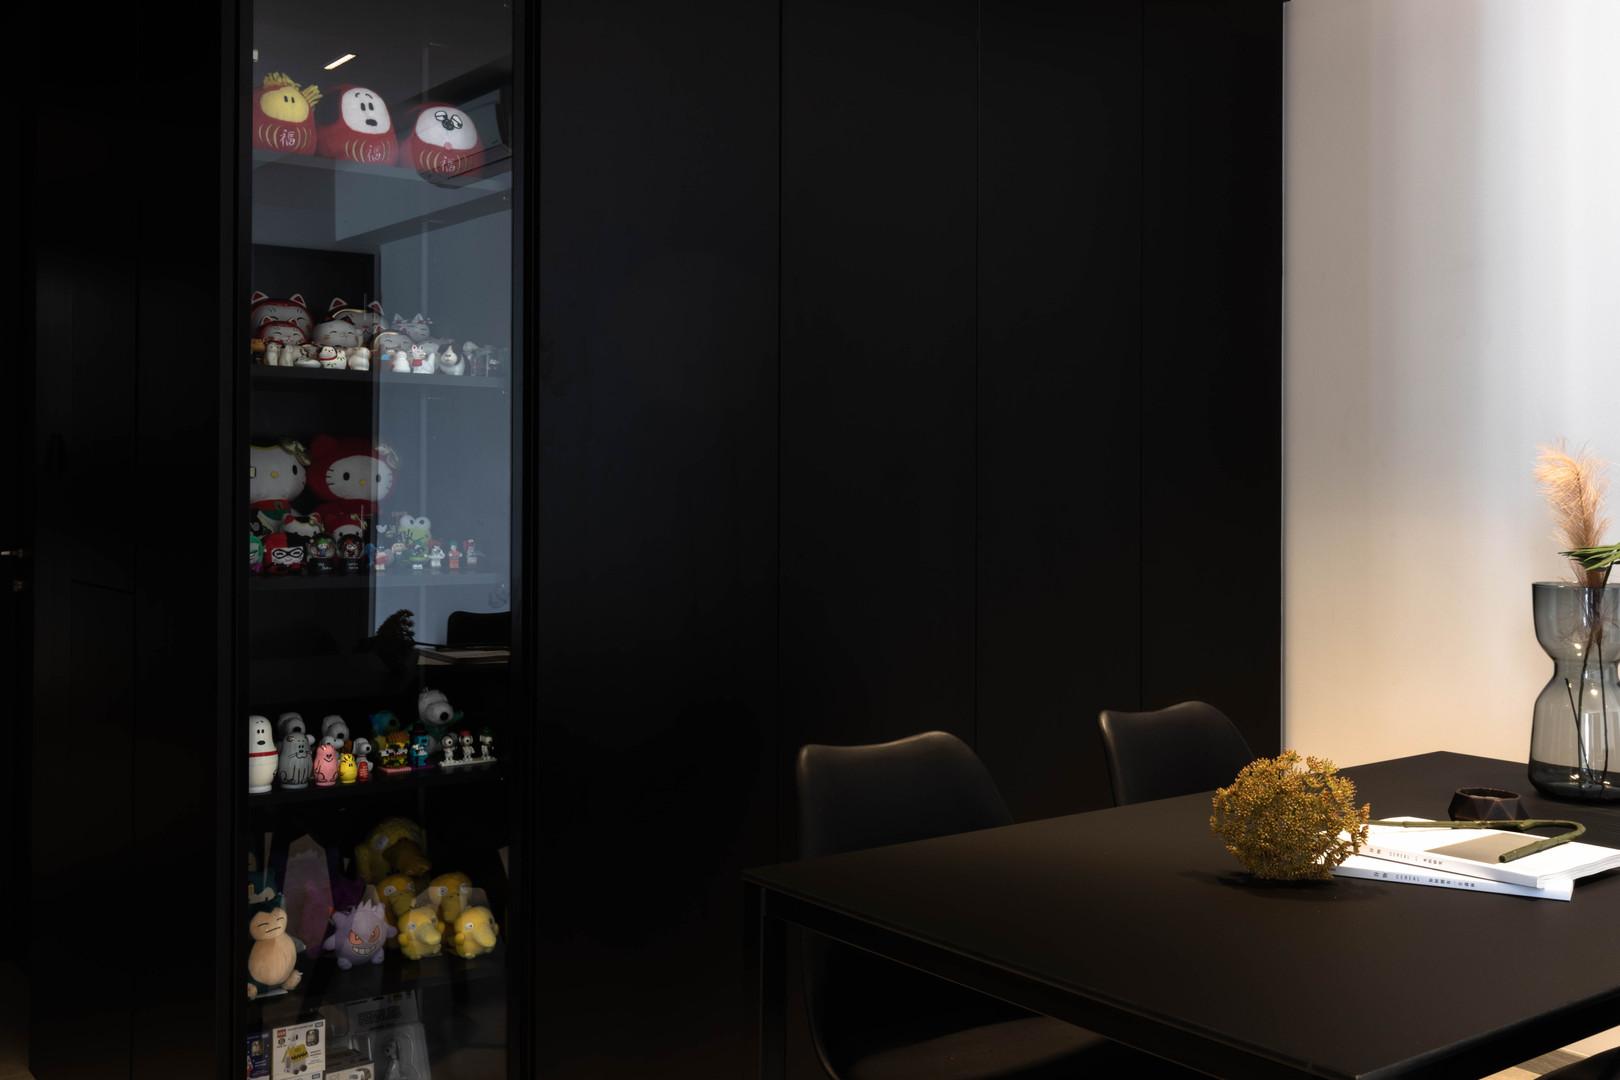 Hock Hoon, Interior Design Singapore, Minimalist Interior Design, Botanique at Bartley, Carpentry, Castlery, Sol Luminaire, TV Console, Sofa, Dining Table, Inz Residence, Monochrome design